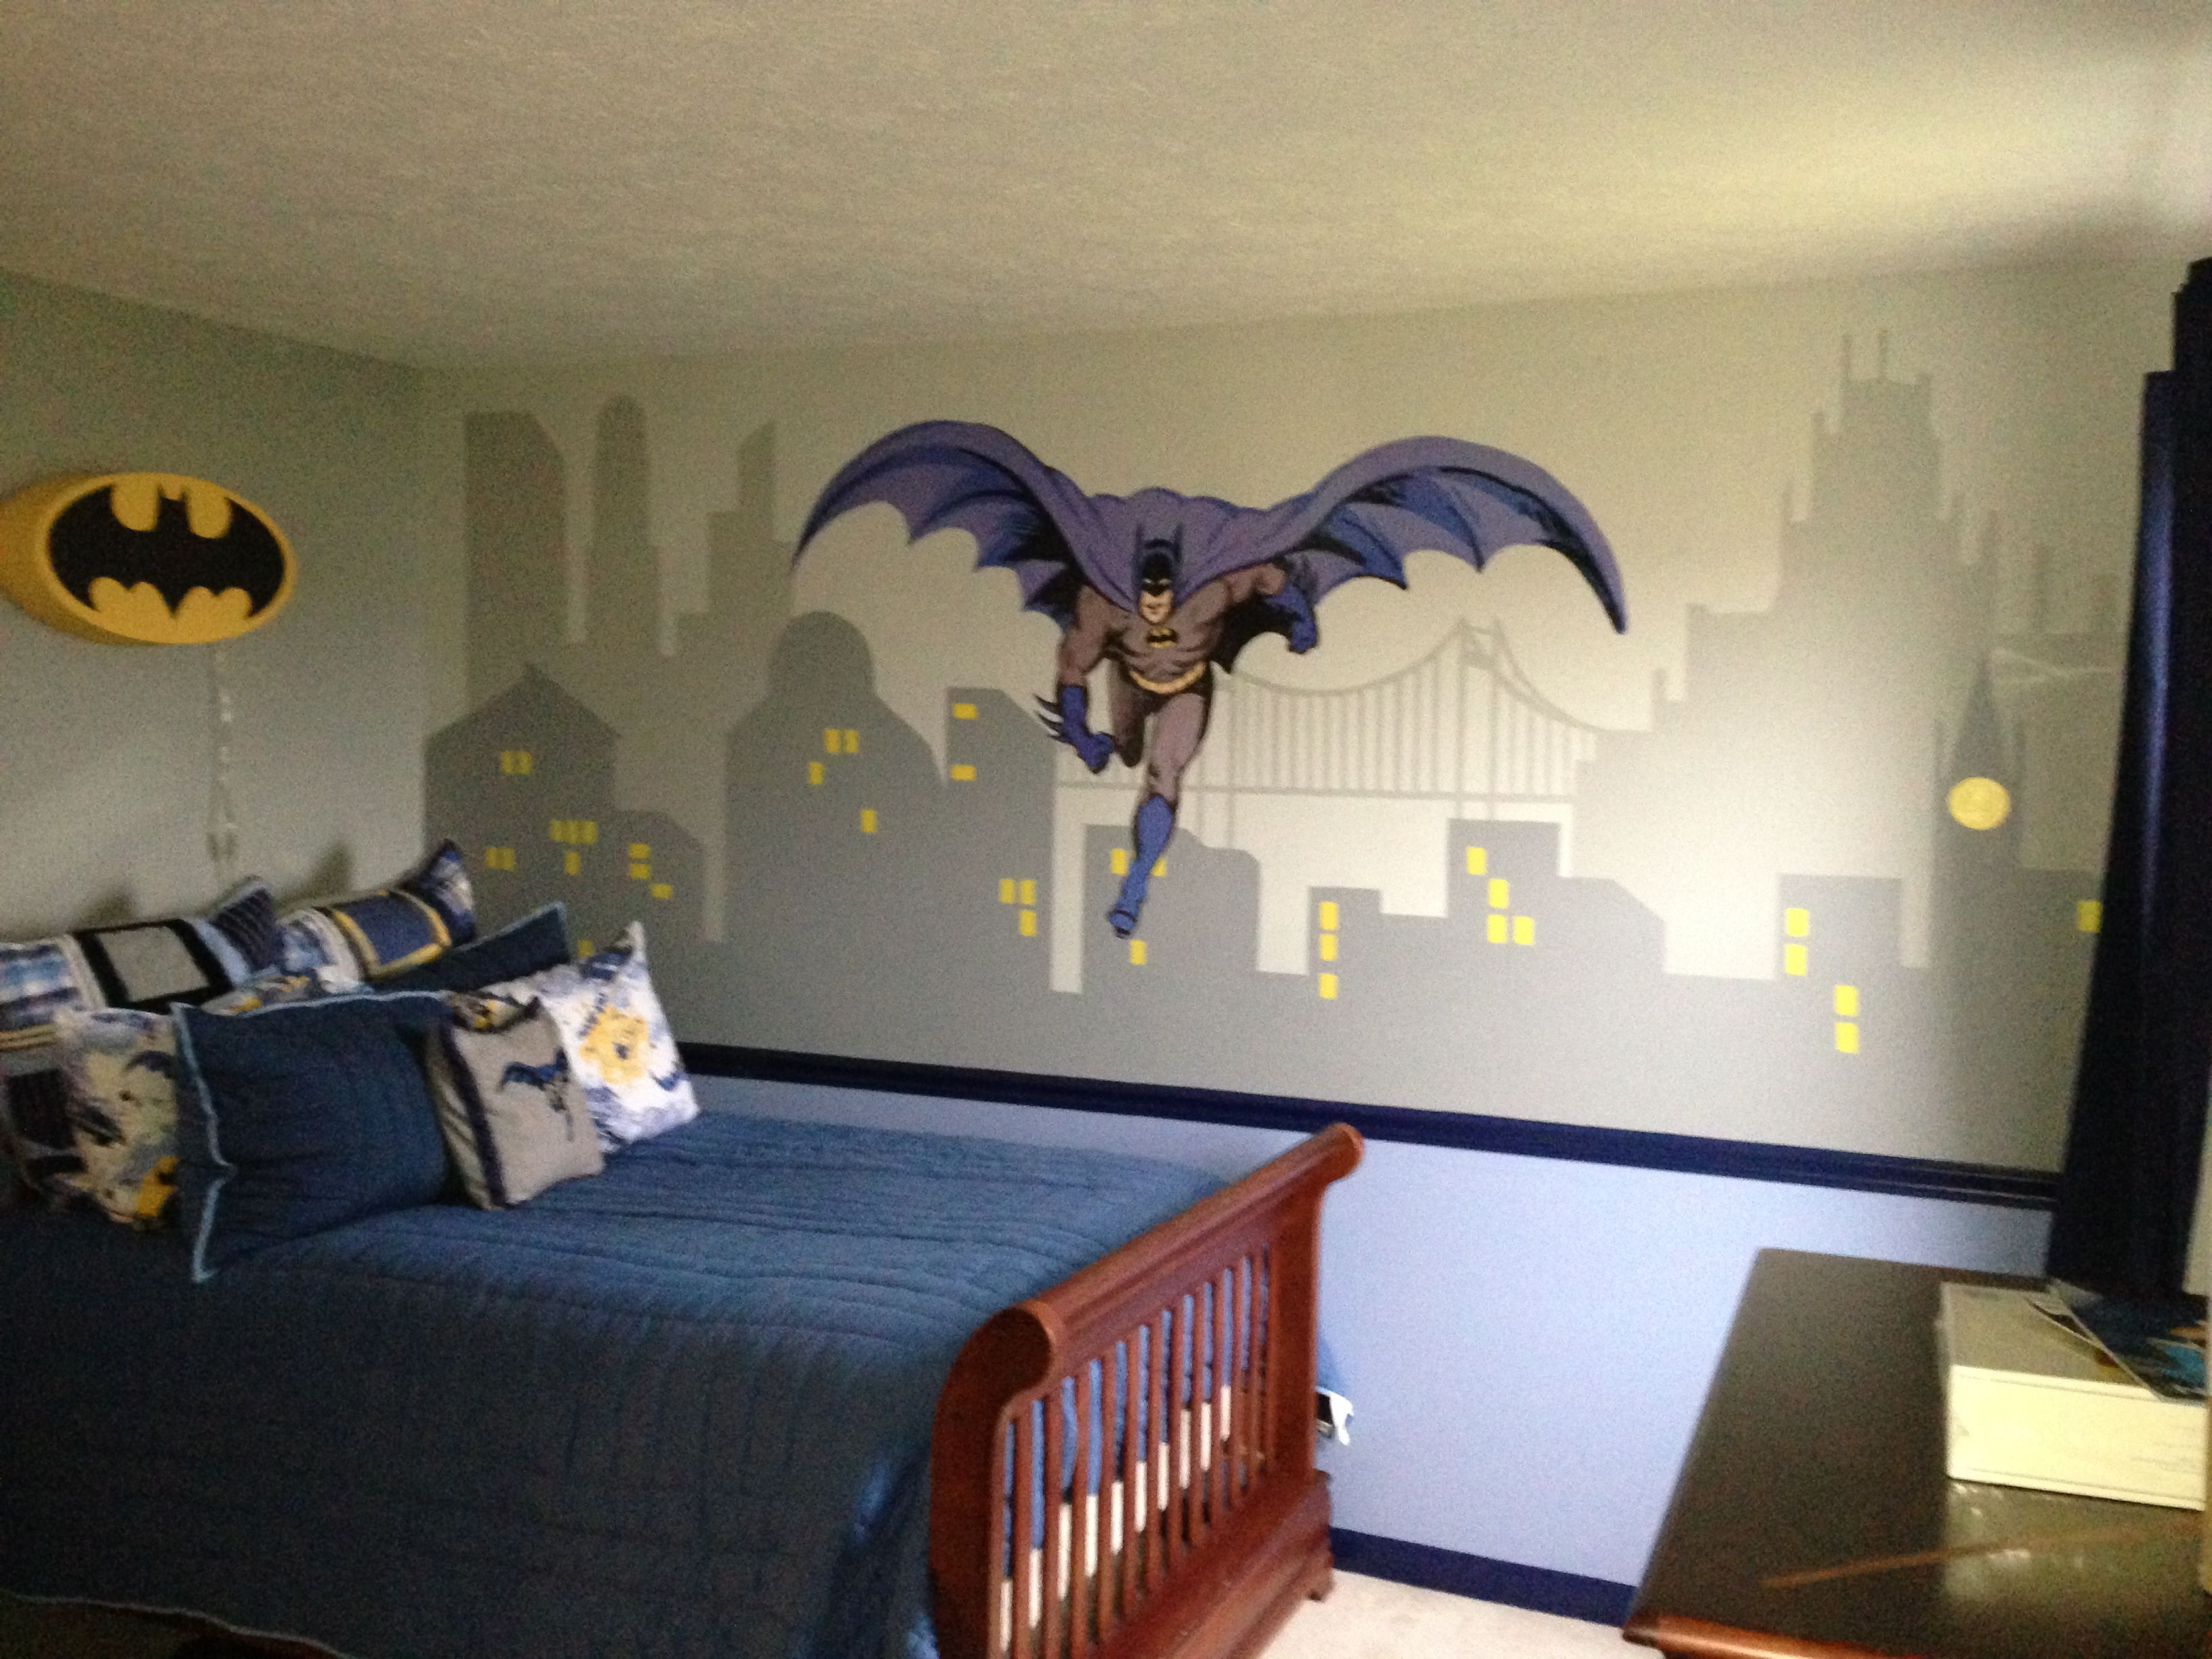 Pottery barn kids batman theme bedroom nursery decor Pinterest